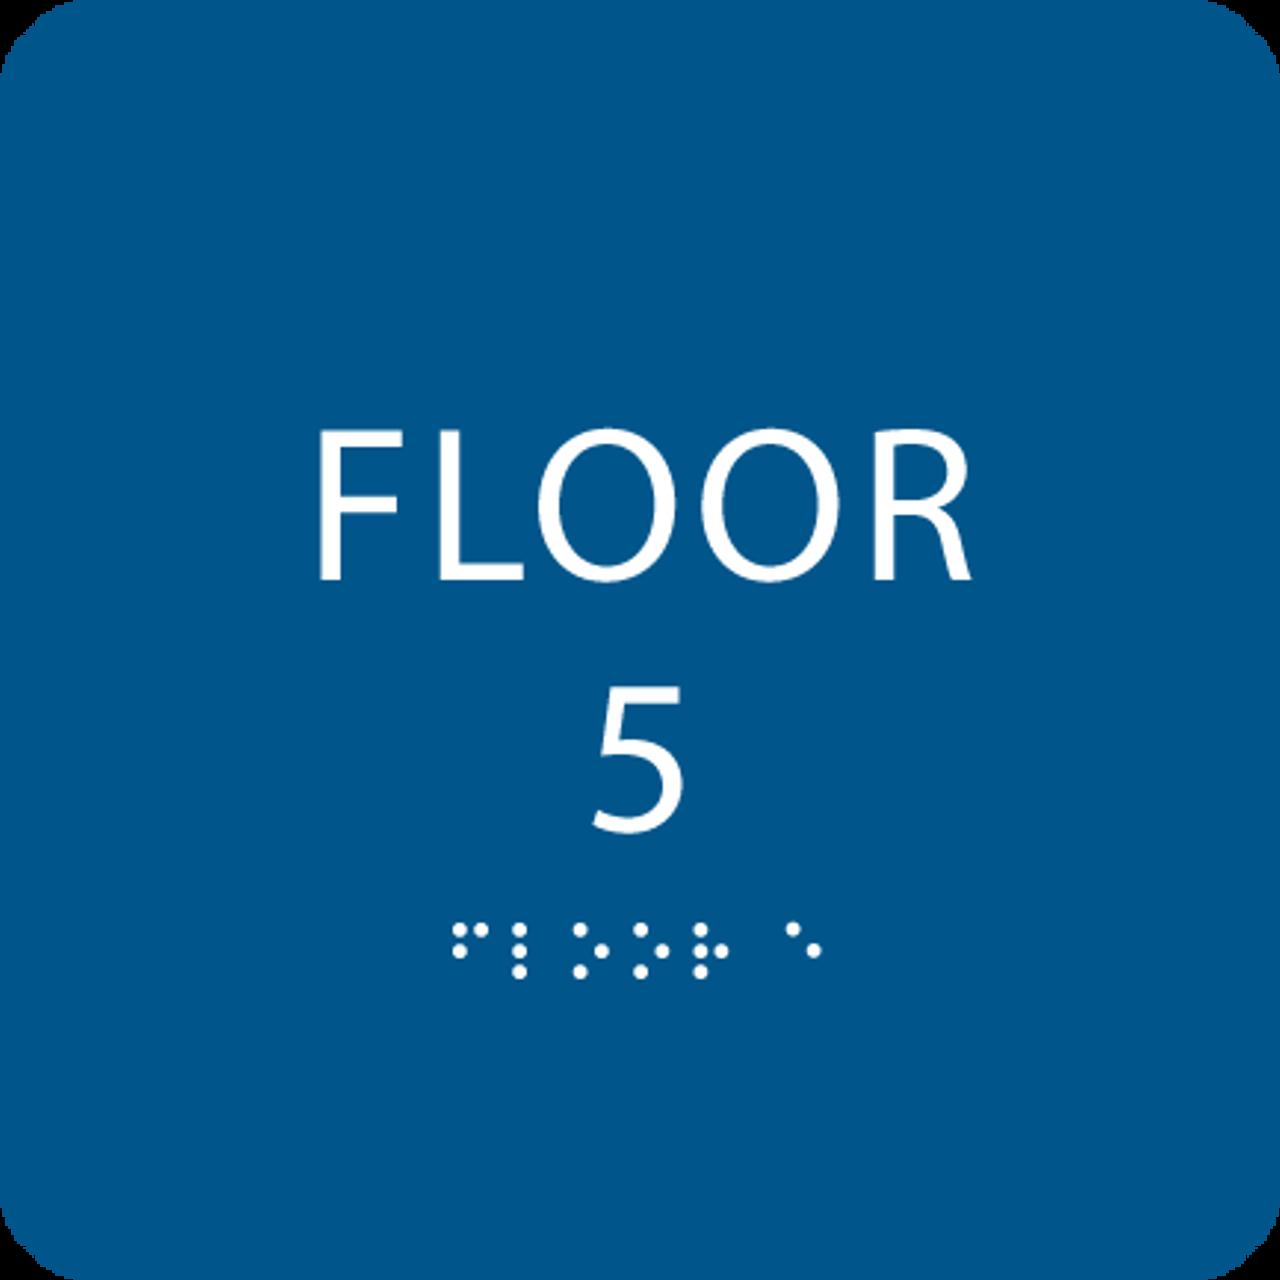 Blue Floor 5 Level Identification Sign